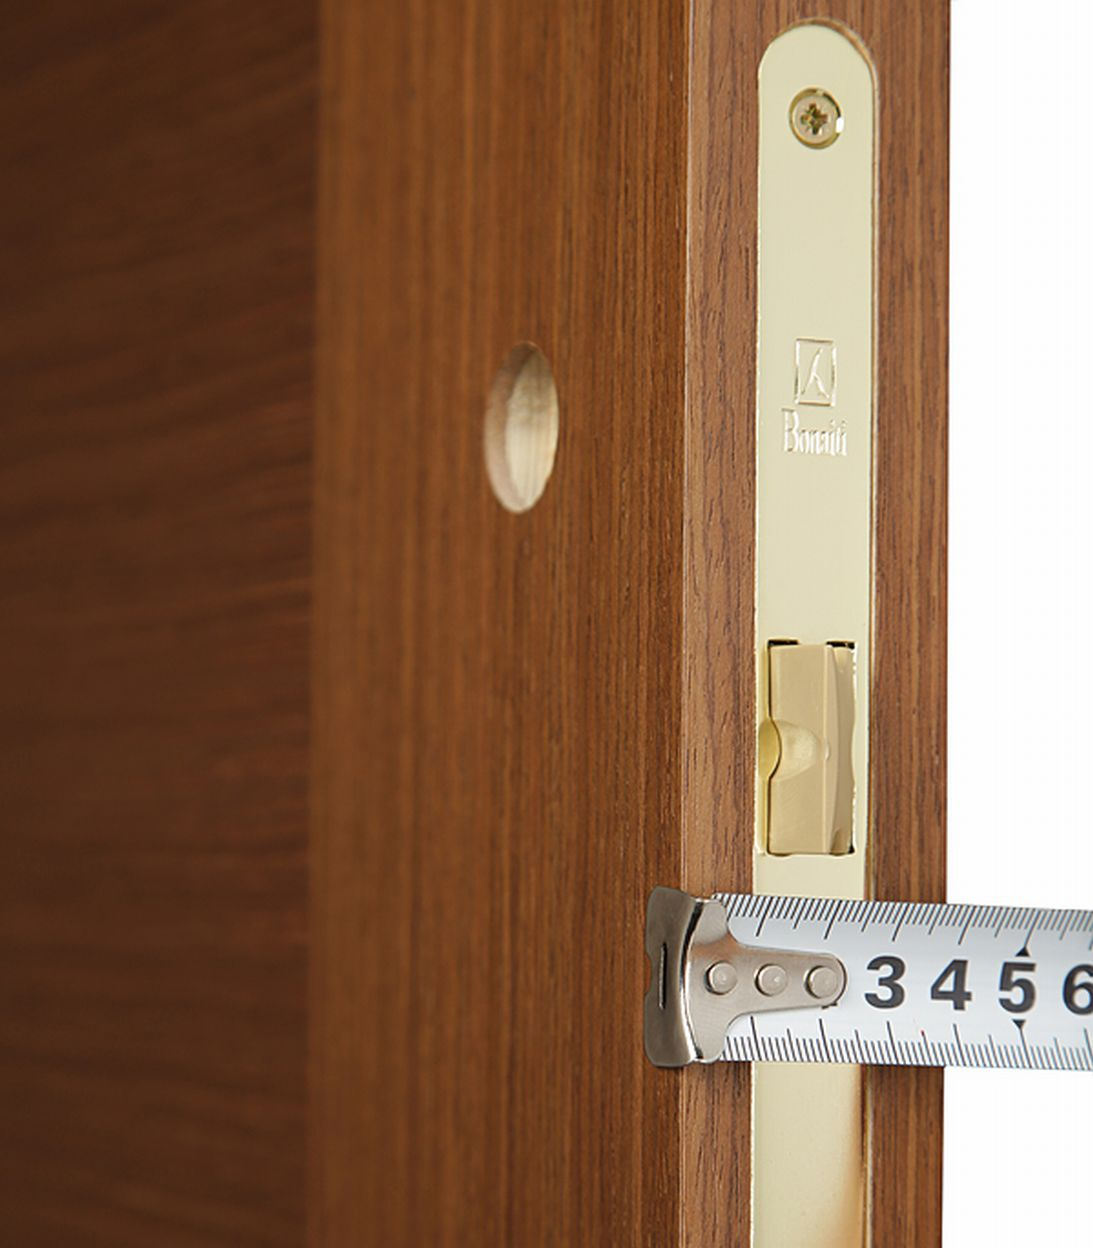 Дверное полотно Mario Rioli Vario орех глухое шпон 900x2000 мм фото